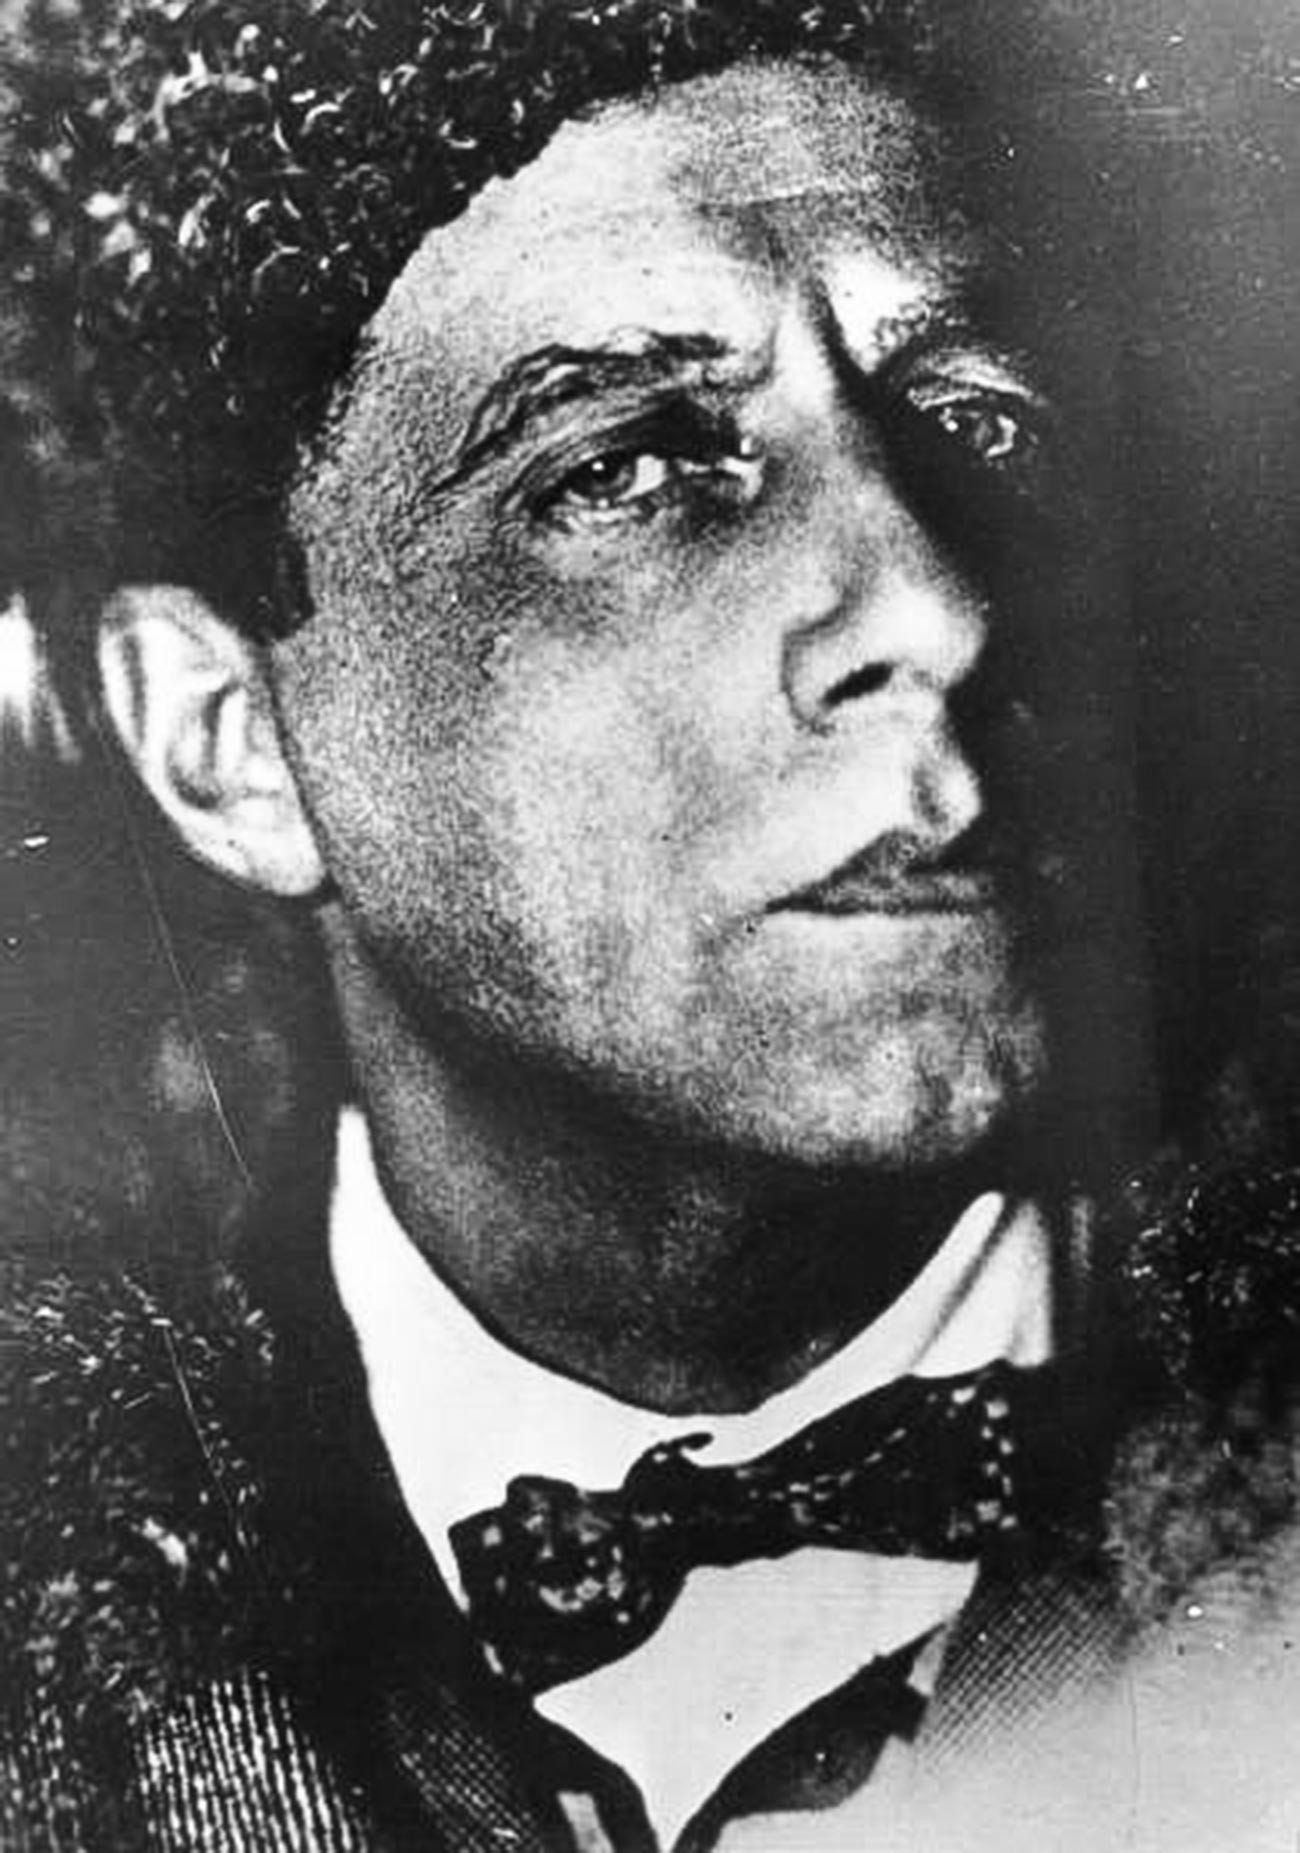 Legendary theater director Vsevolod Meyerhold, 1932